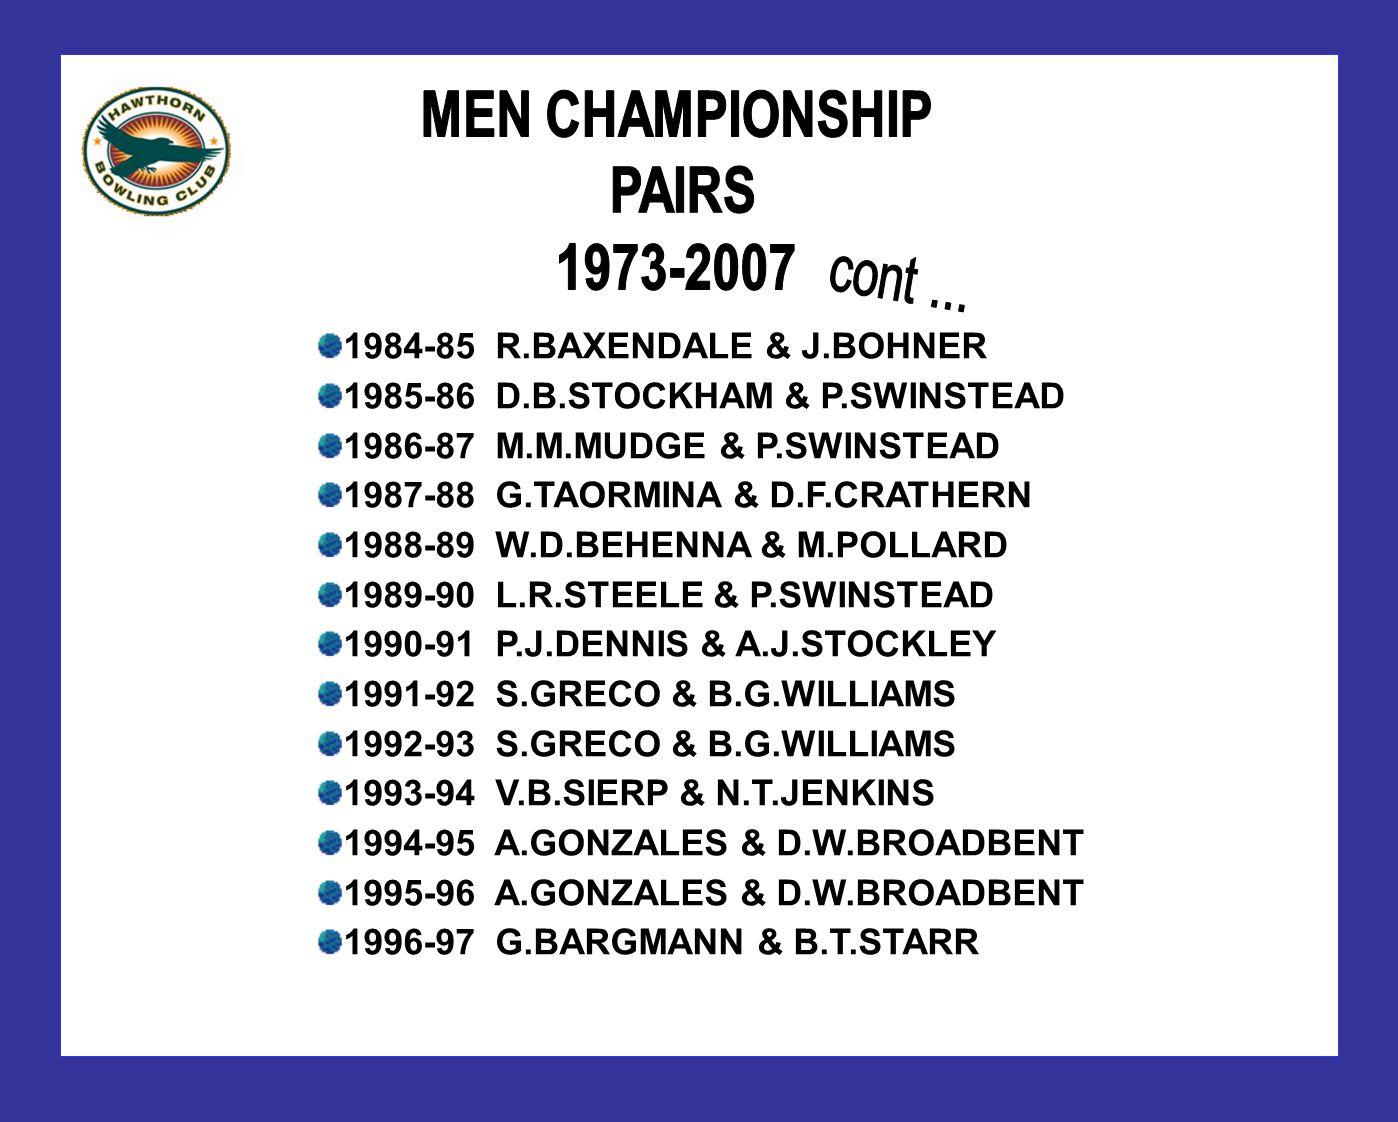 1984-85 R.BAXENDALE & J.BOHNER 1985-86 D.B.STOCKHAM & P.SWINSTEAD 1986-87 M.M.MUDGE & P.SWINSTEAD 1987-88 G.TAORMINA & D.F.CRATHERN 1988-89 W.D.BEHENN